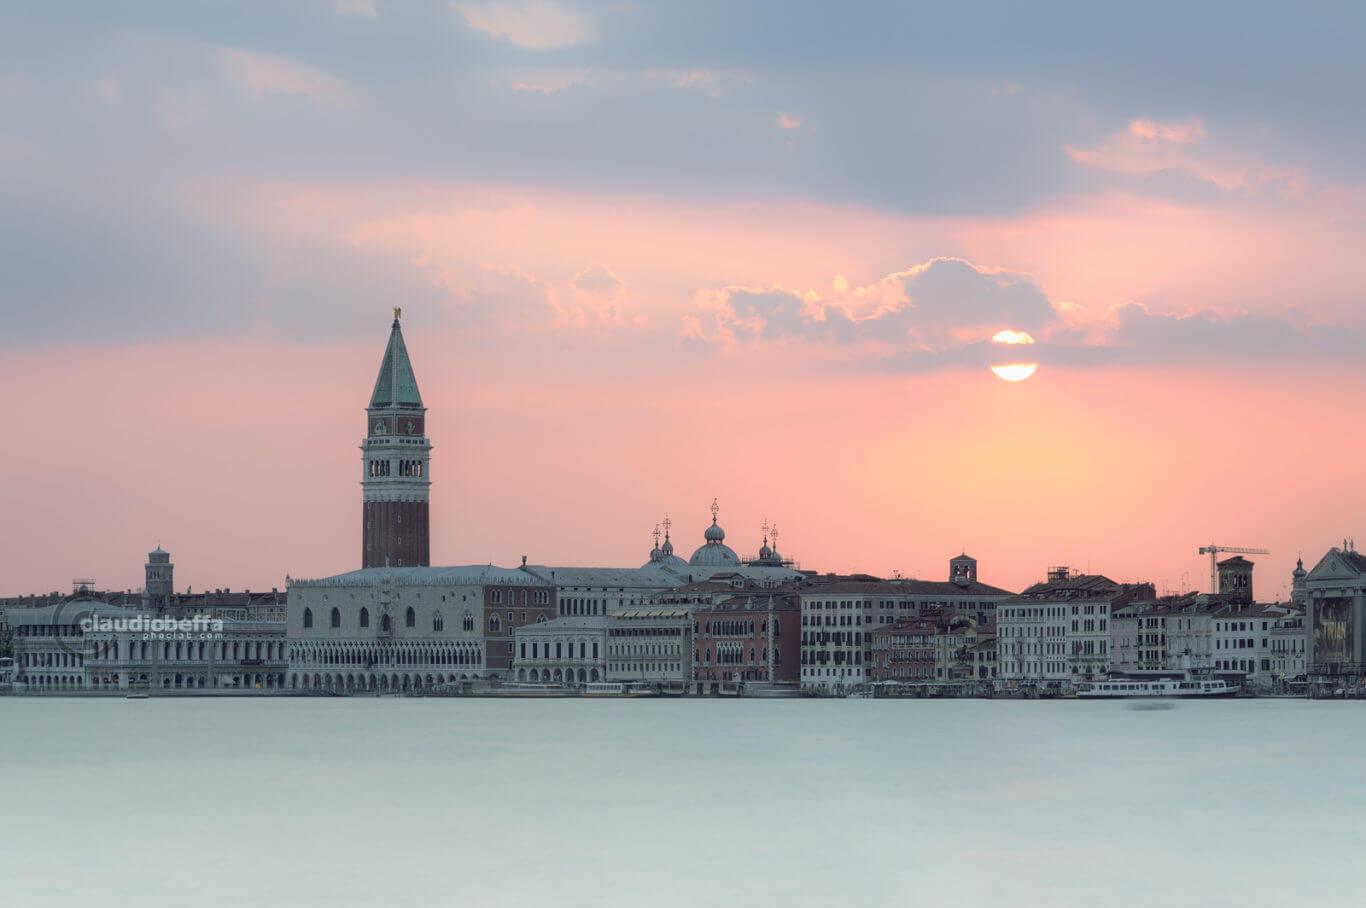 Sunset, Pastel sunset, Venice, Venezia, Italia, San Marco, Riva degli Schiavoni, Lagoon, Water, Reflections, Bursts of light, Pastel, Colors